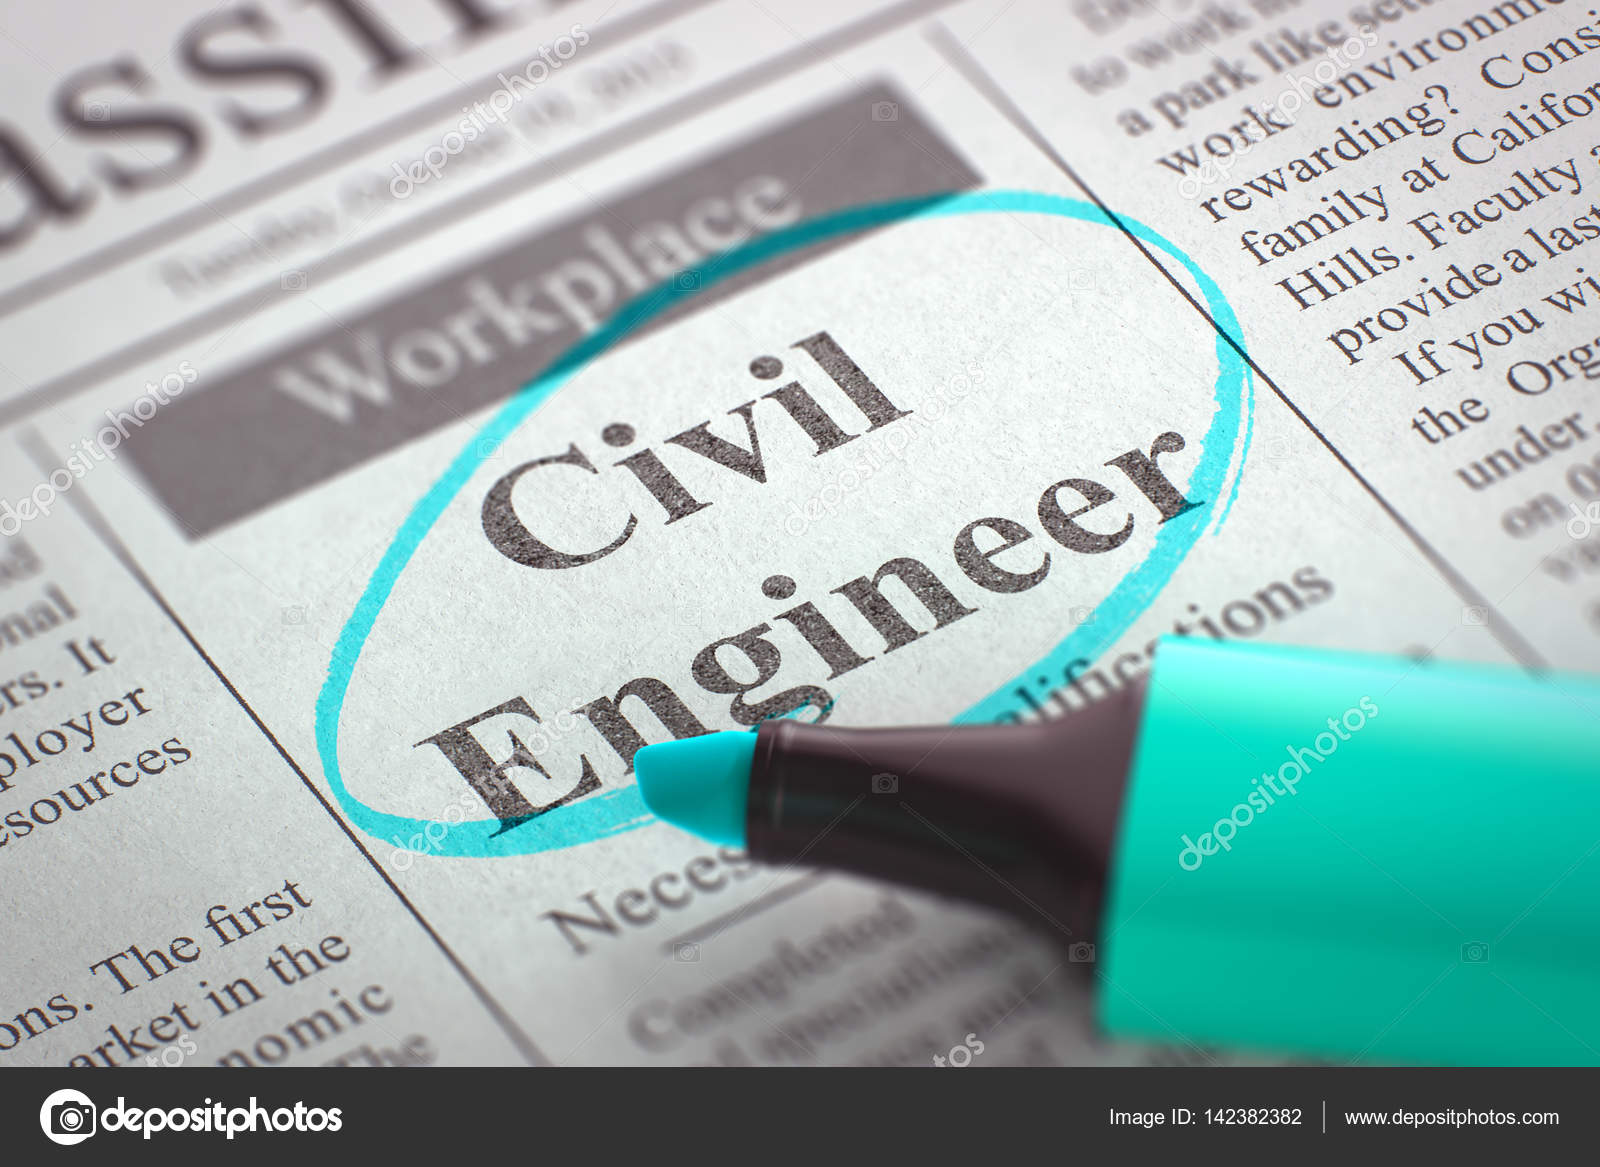 Image result for hiring Civil Engineer